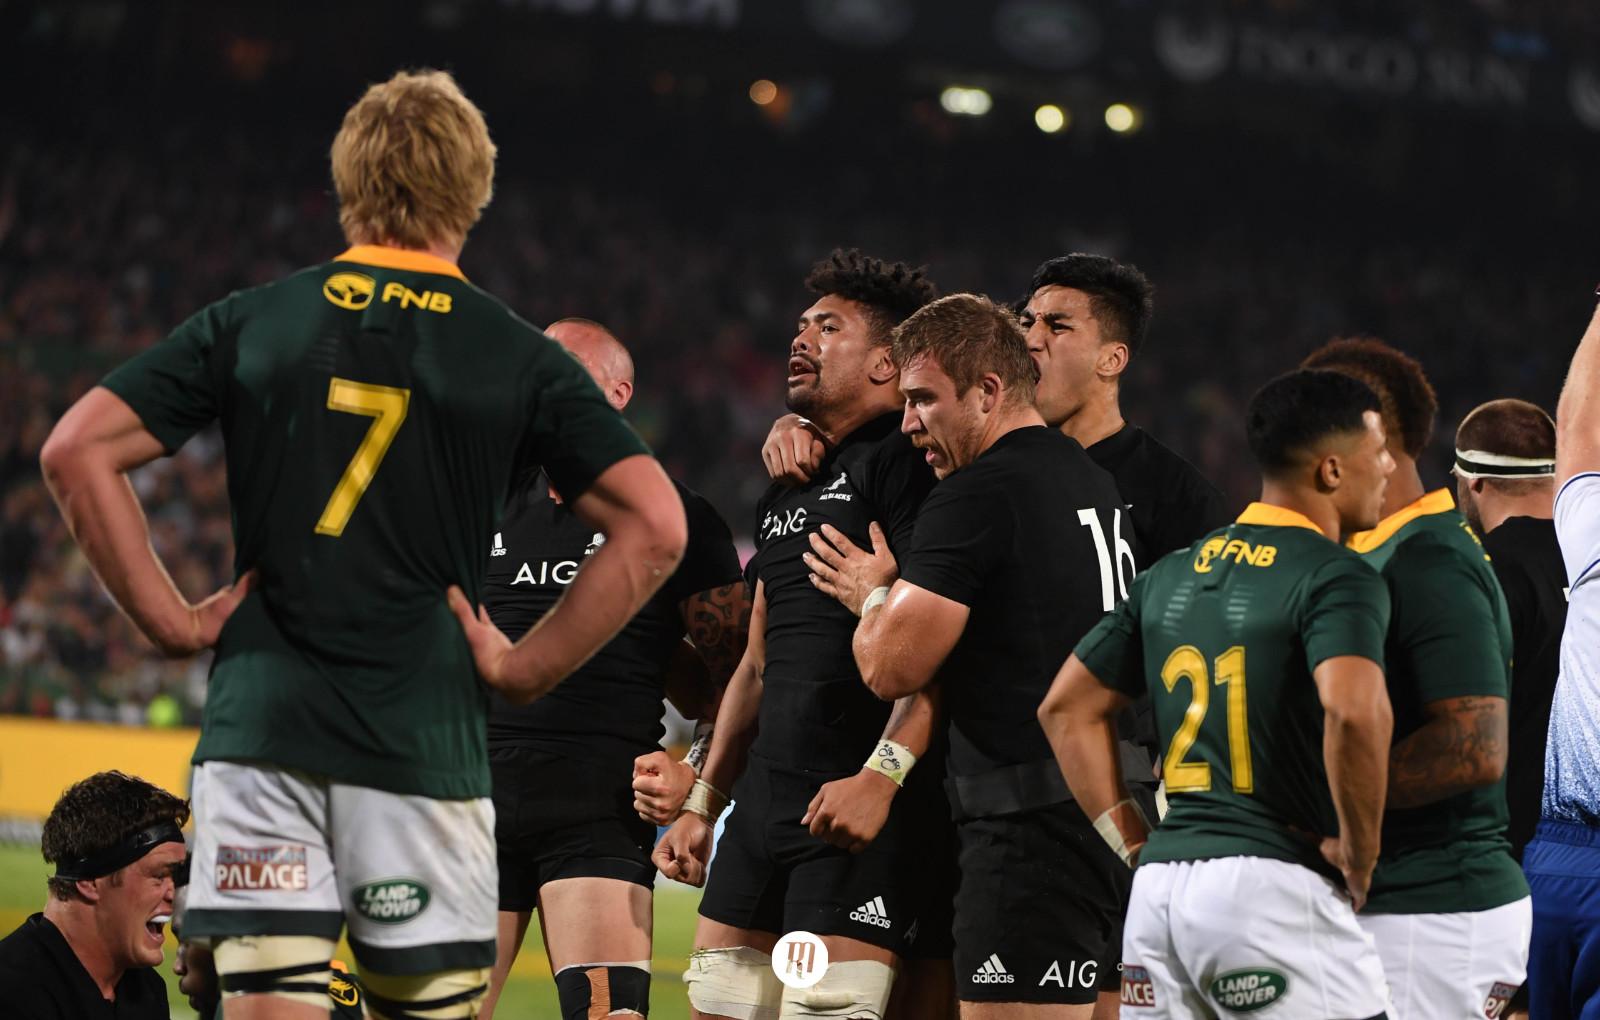 Match Analysis: South Africa v New Zealand